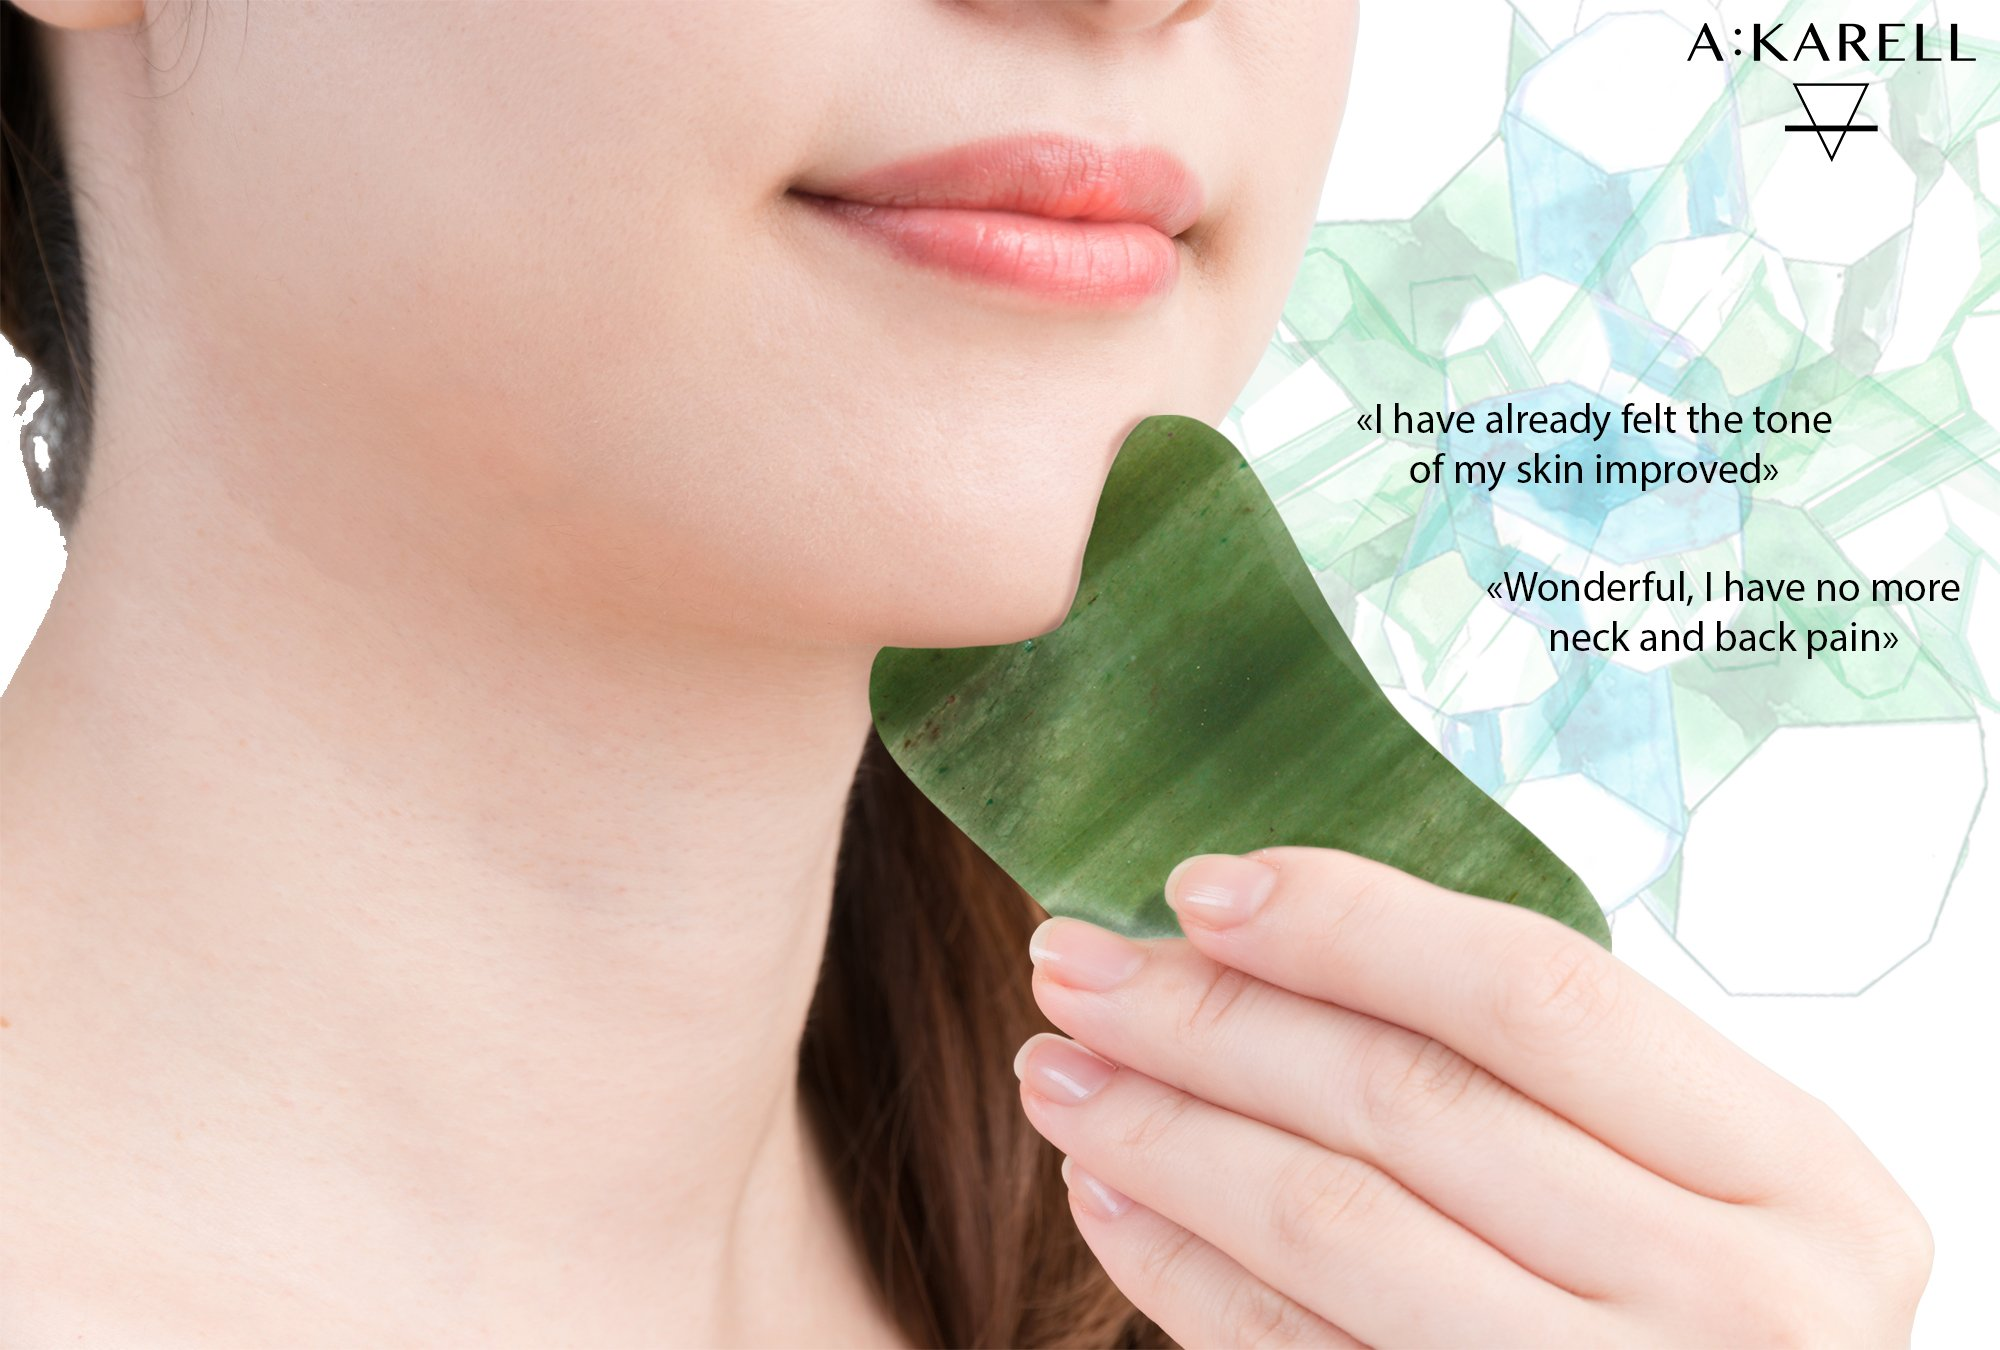 A:KARELL Jade Roller For Face & Gua Sha SET 100% Real Chi Himalayan Jade Anti Aging Skincare Therapy Tool Jade Facial Roller Depuffing Anti-Wrinkle Facial Roller De Puffer Massager by A : KARELL